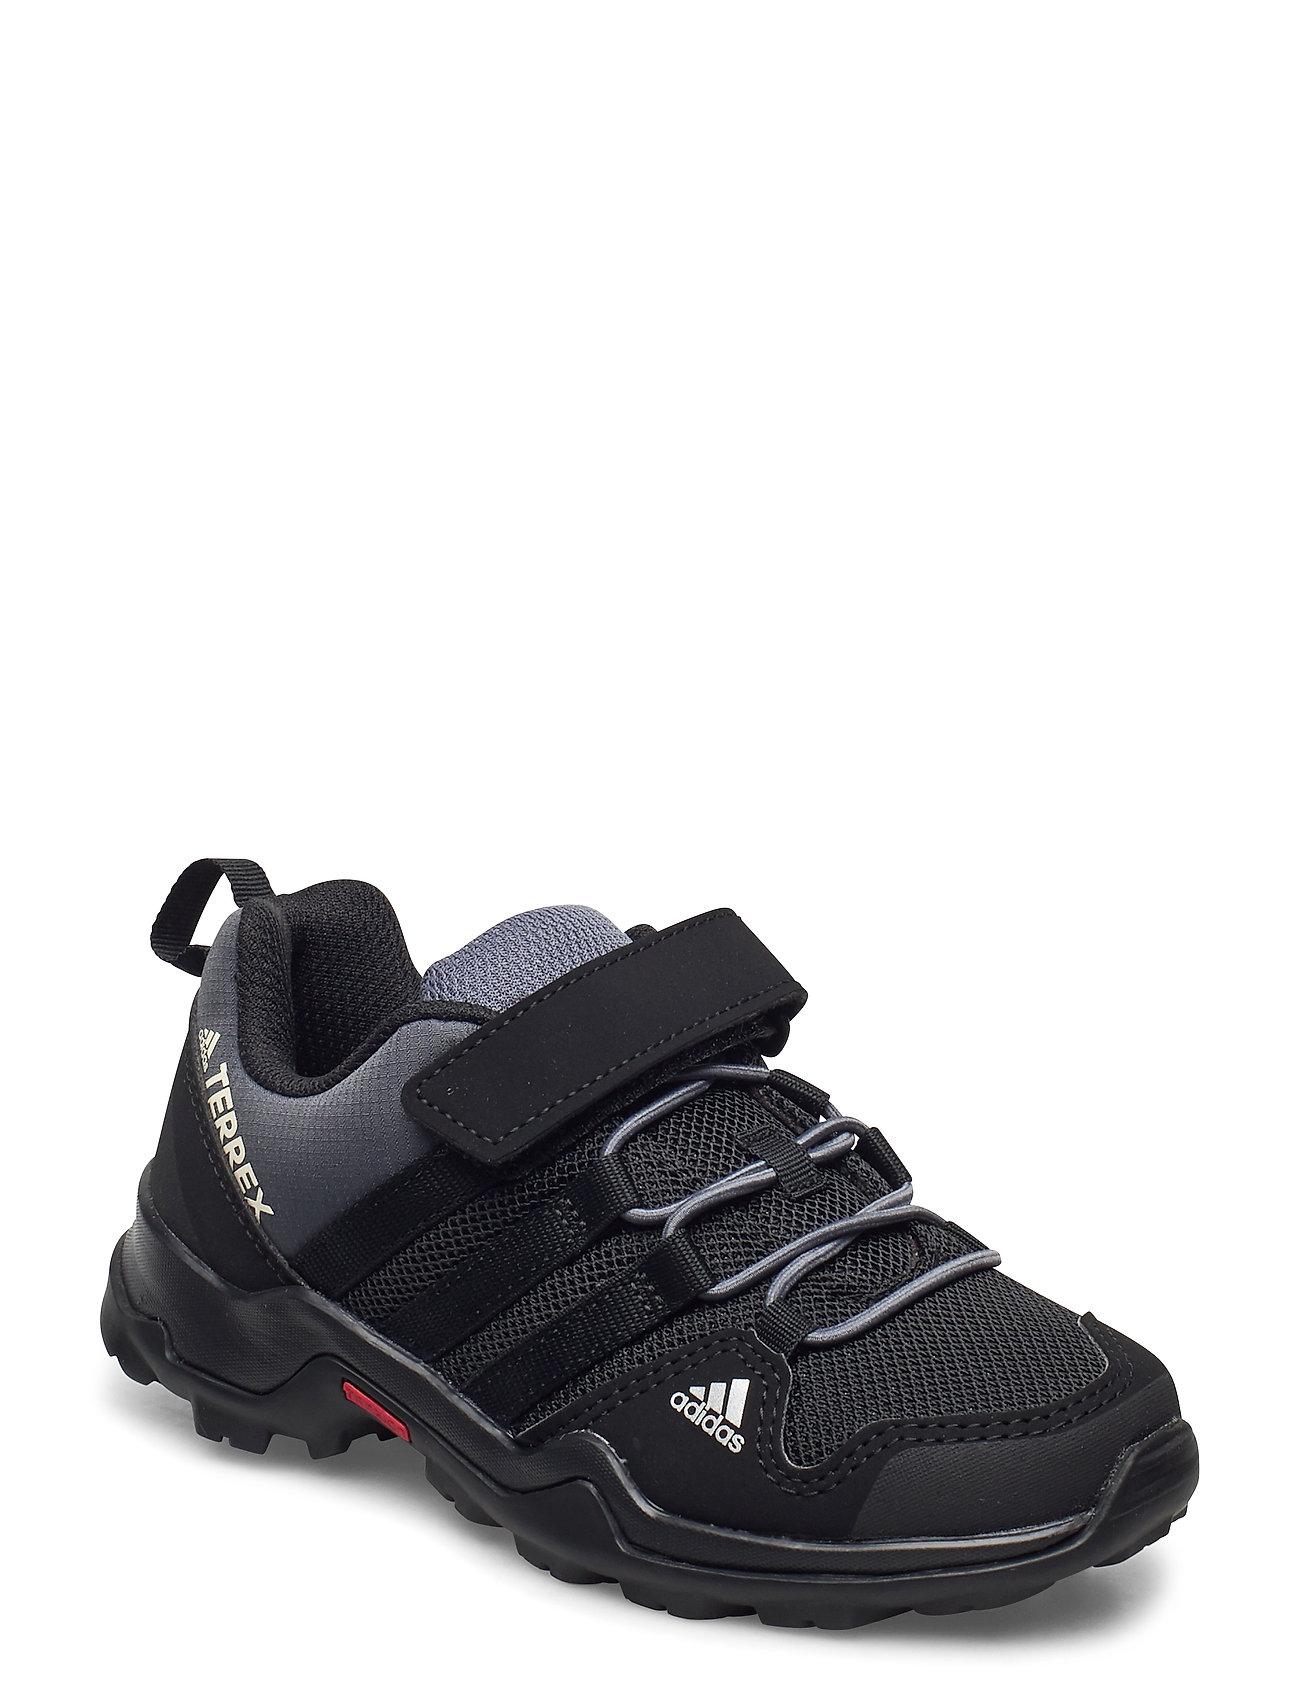 Terrex Ax2r Cf K Shoes Sports Shoes Running/training Shoes Sort Adidas Performance